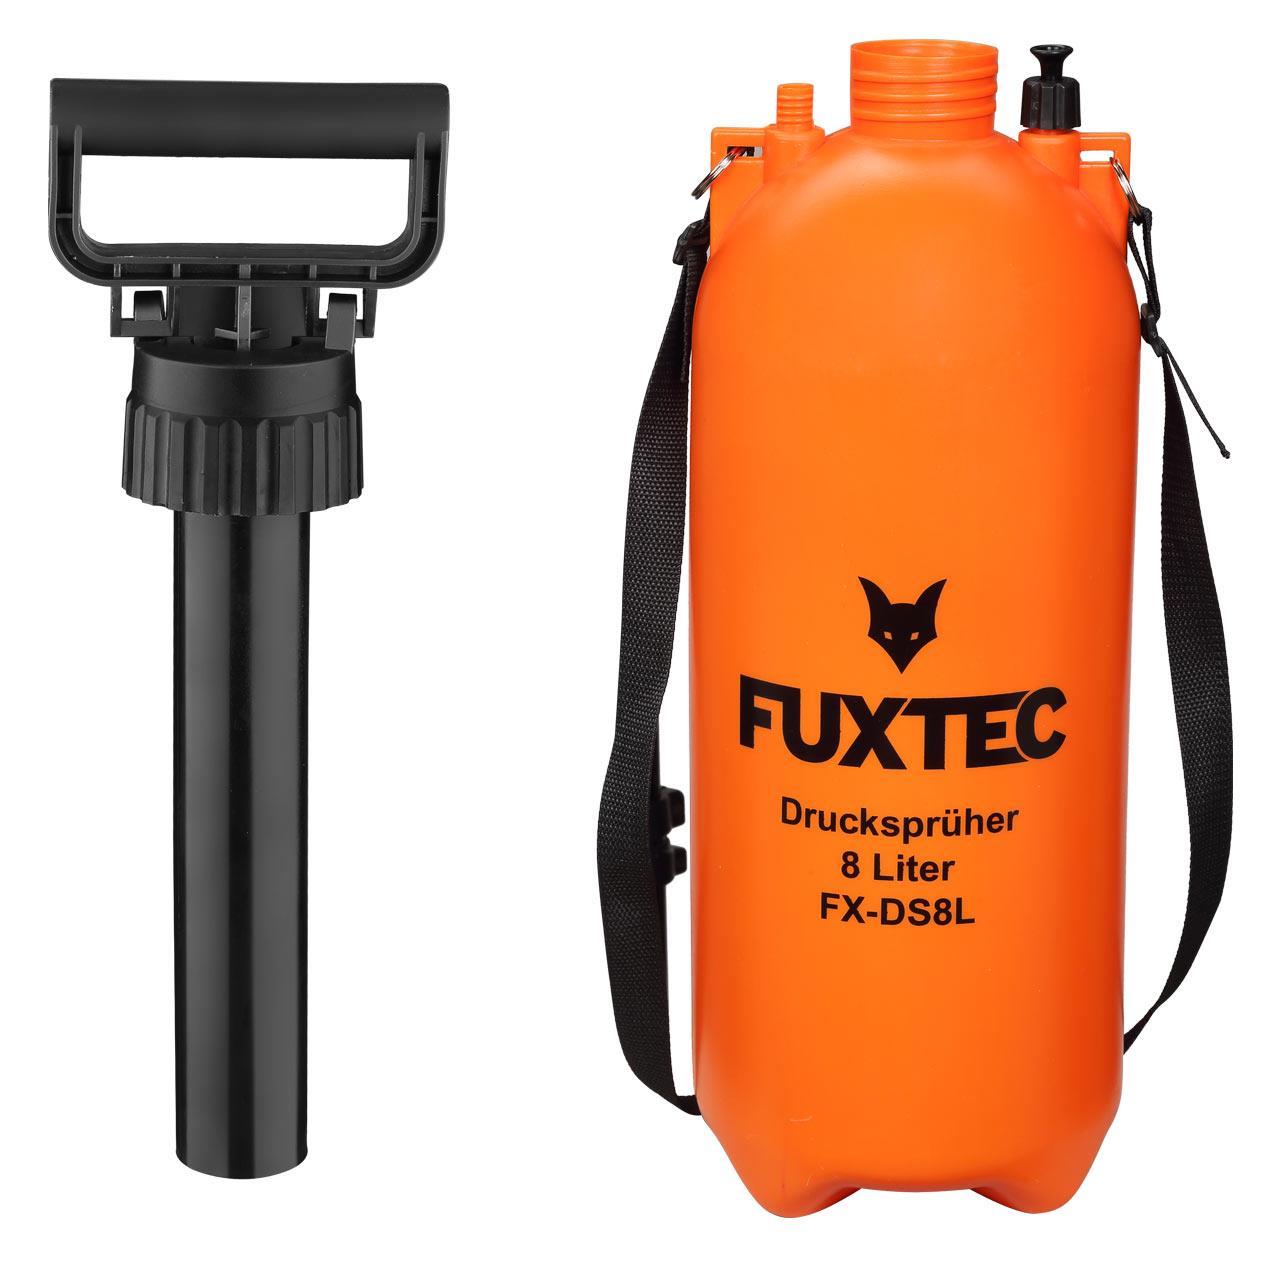 FUXTEC Drucksprüher 8 Liter FX-DS8L